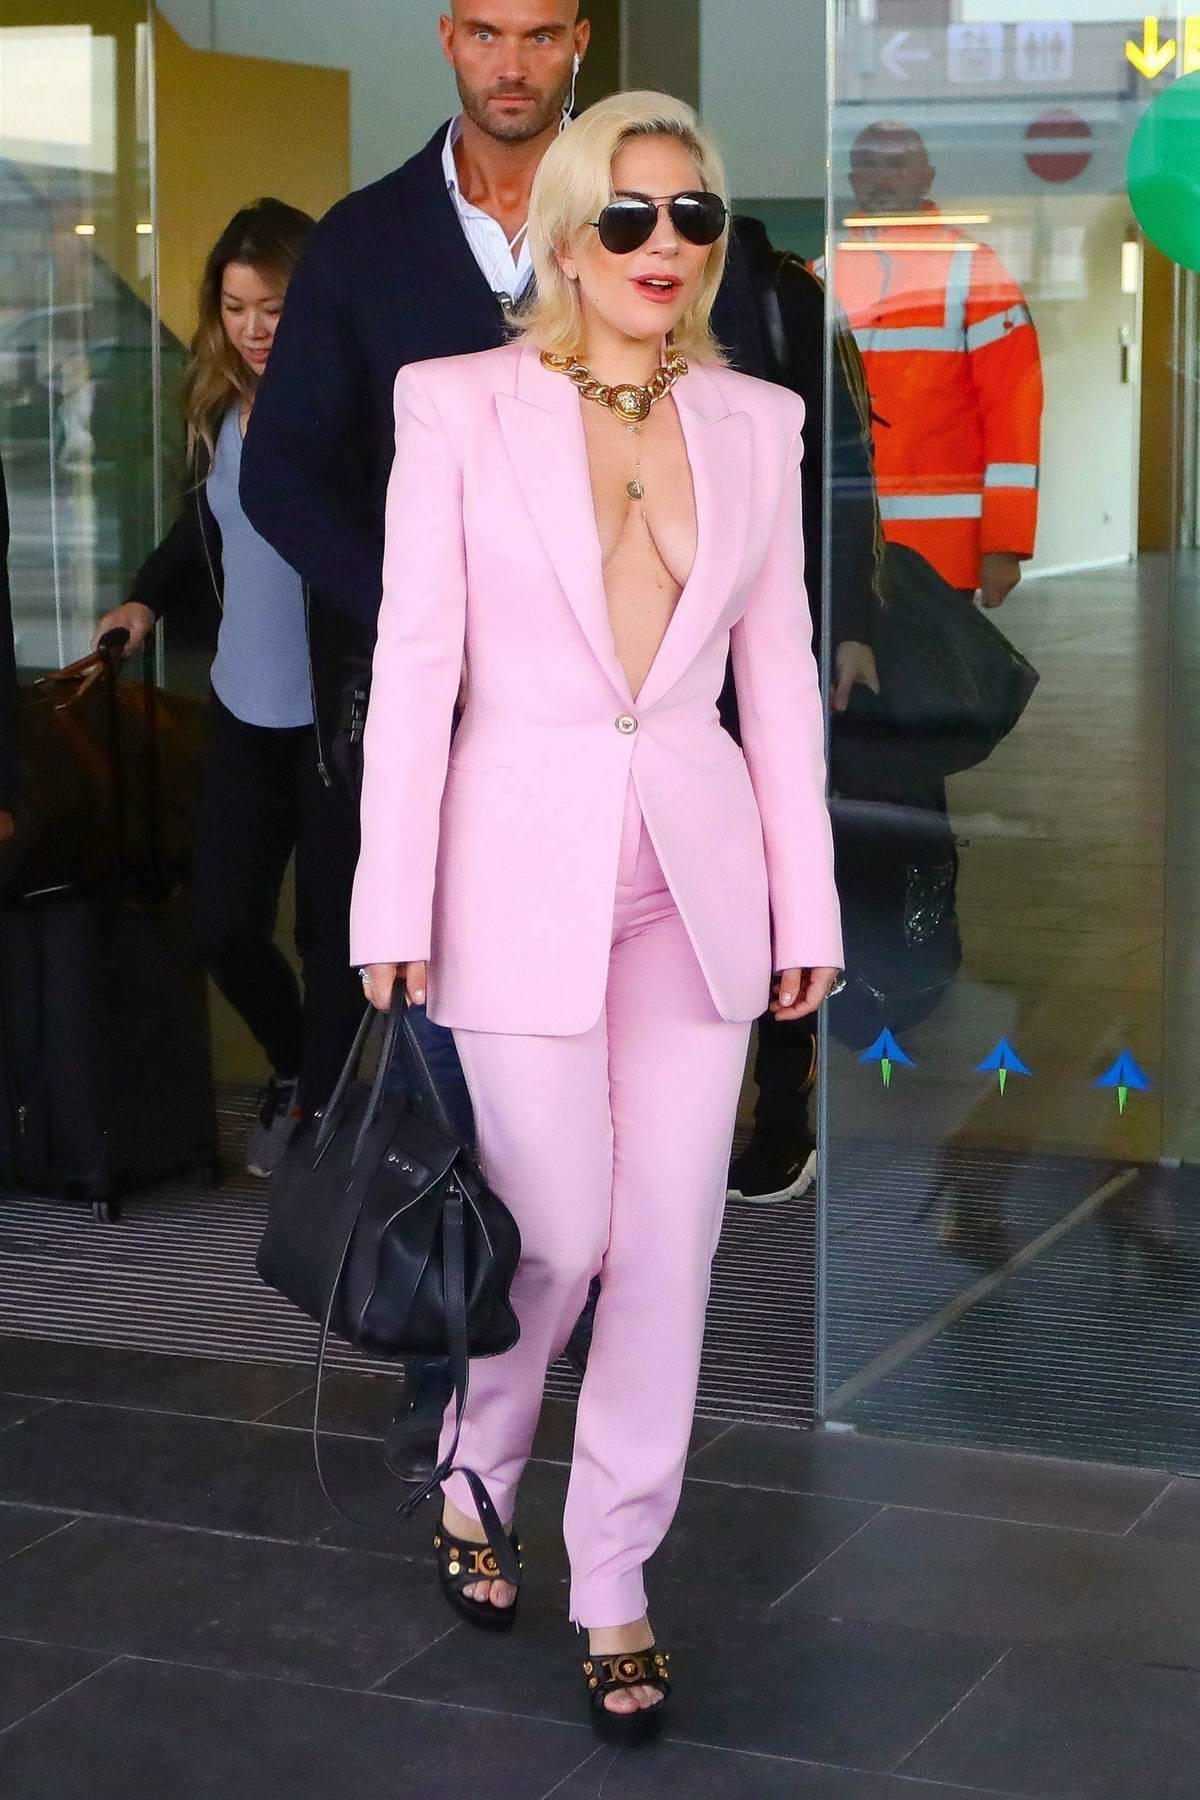 Lady Gaga dressed in a pink pantsuit arrives at Barcelona-El Prat Airport in Barcelona, Spain